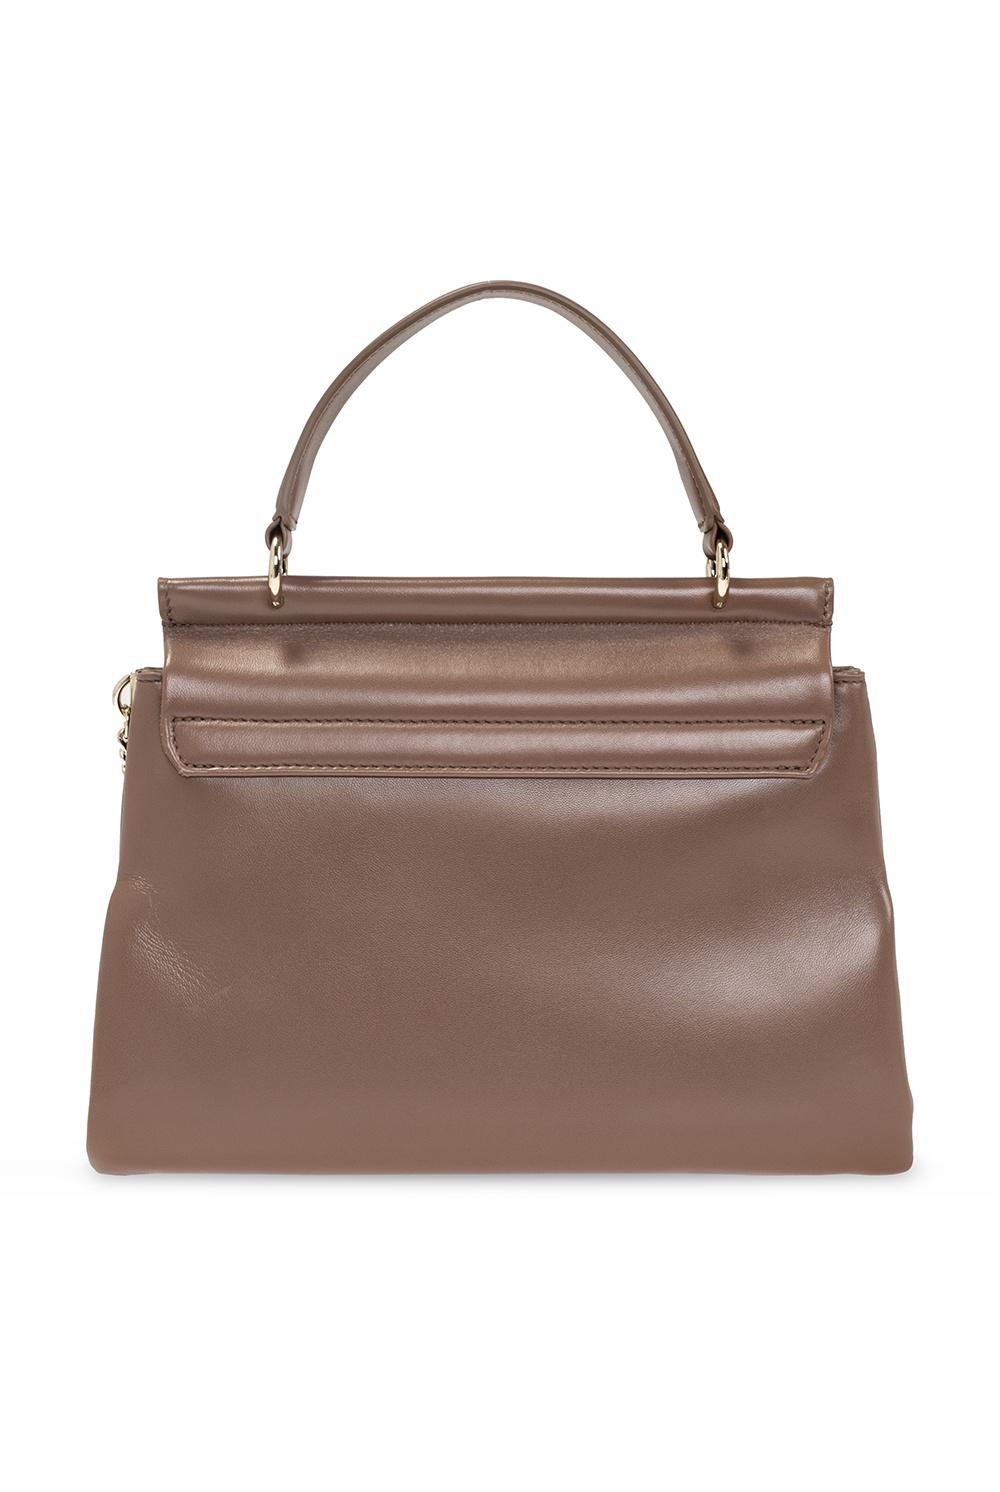 Chloé 'Faye Medium' shoulder bag